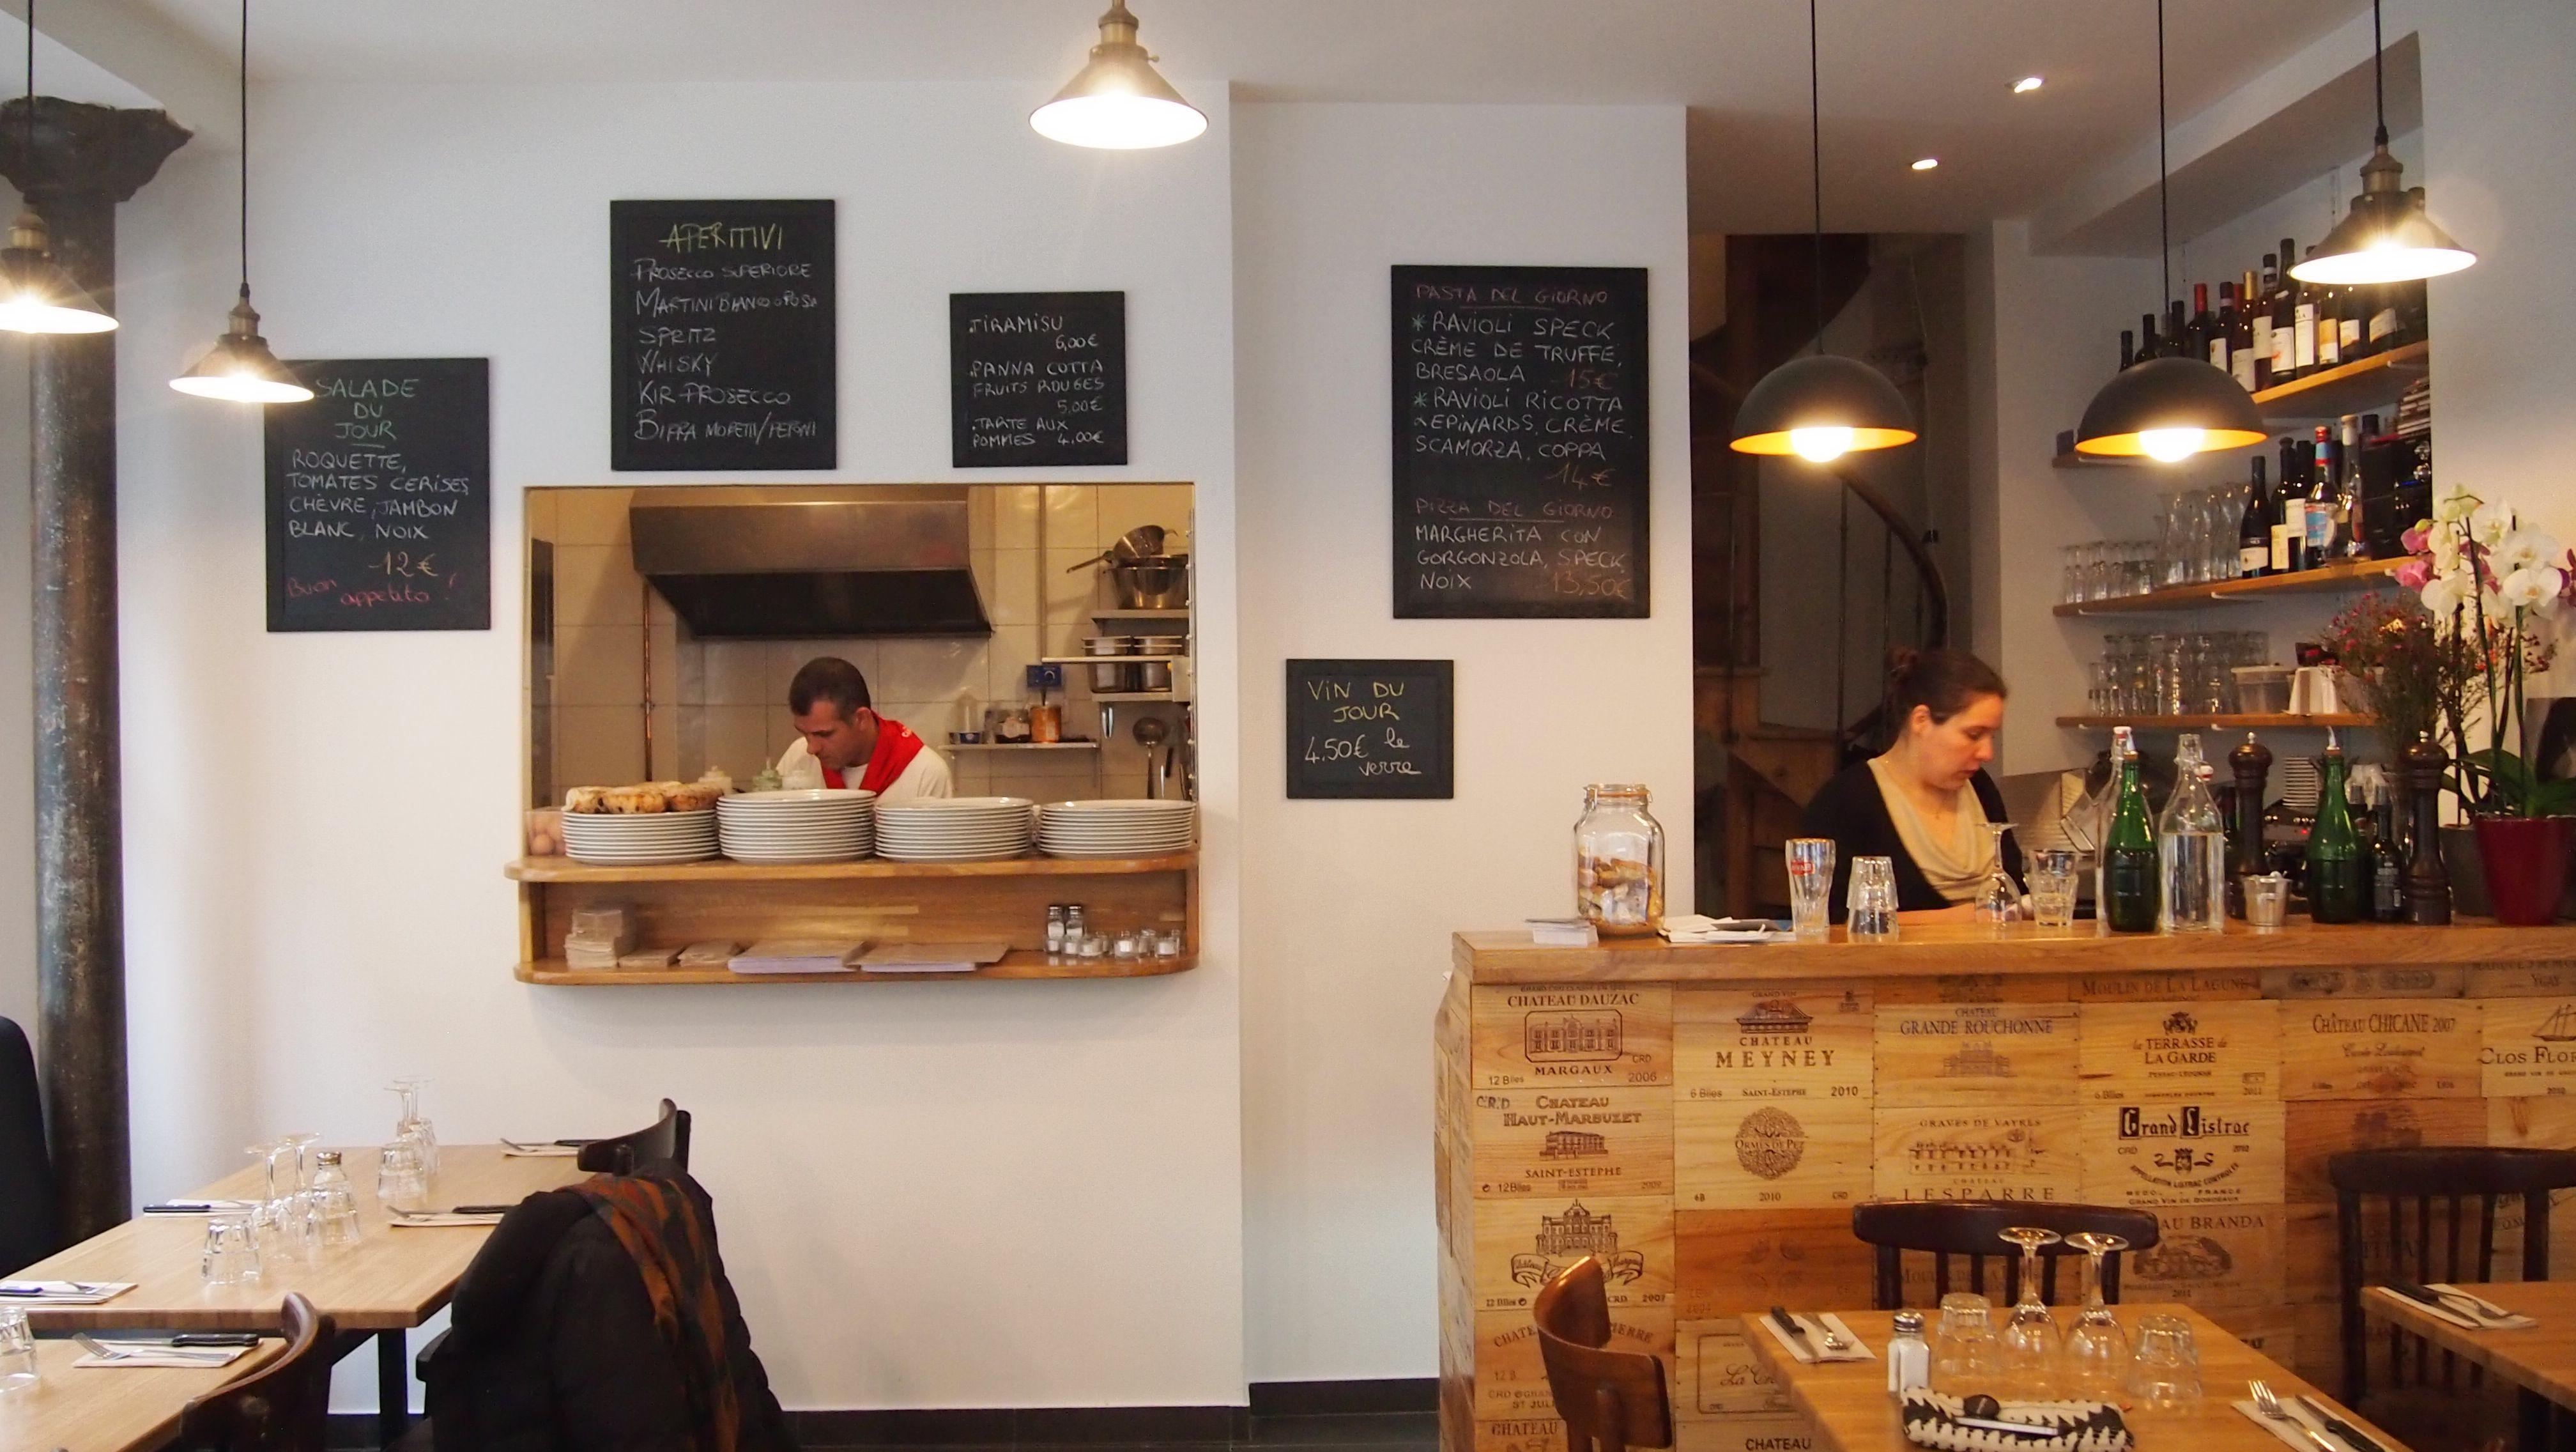 Architecte Interieur Paris 18 pizzeria in bocca al lupo 14 rue francoeur paris 18 #o2r